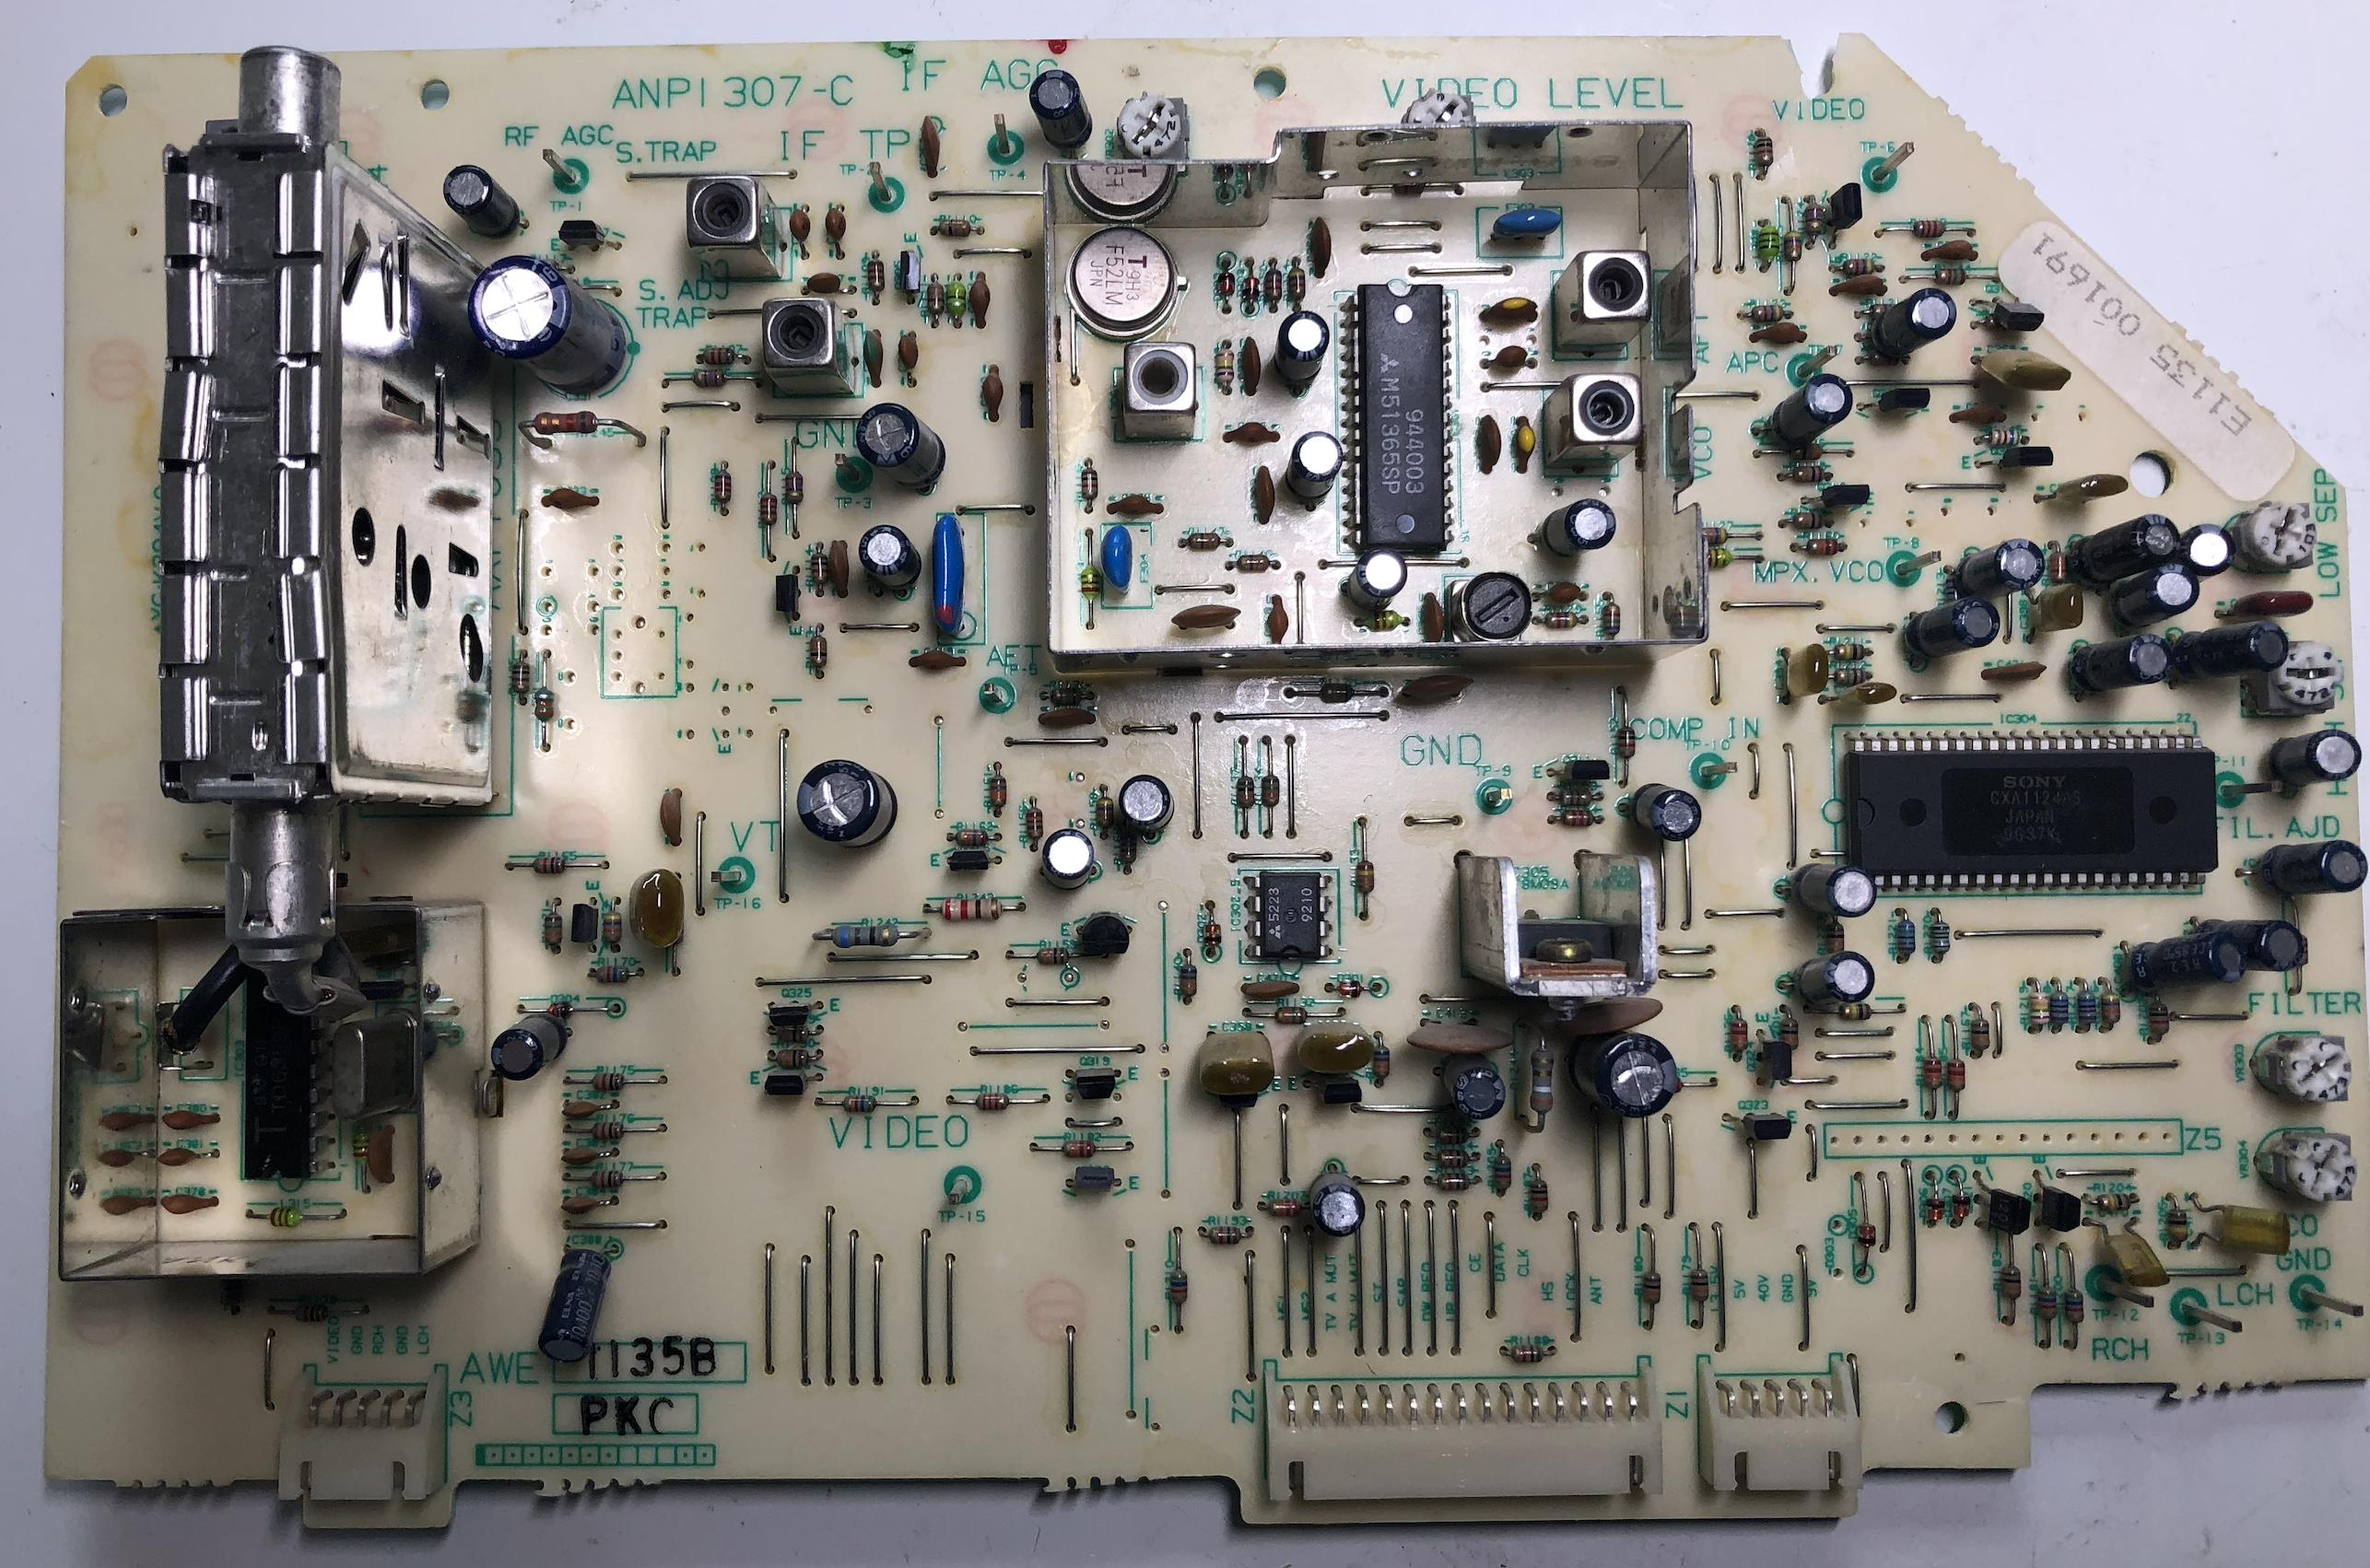 ANPI307-C component side